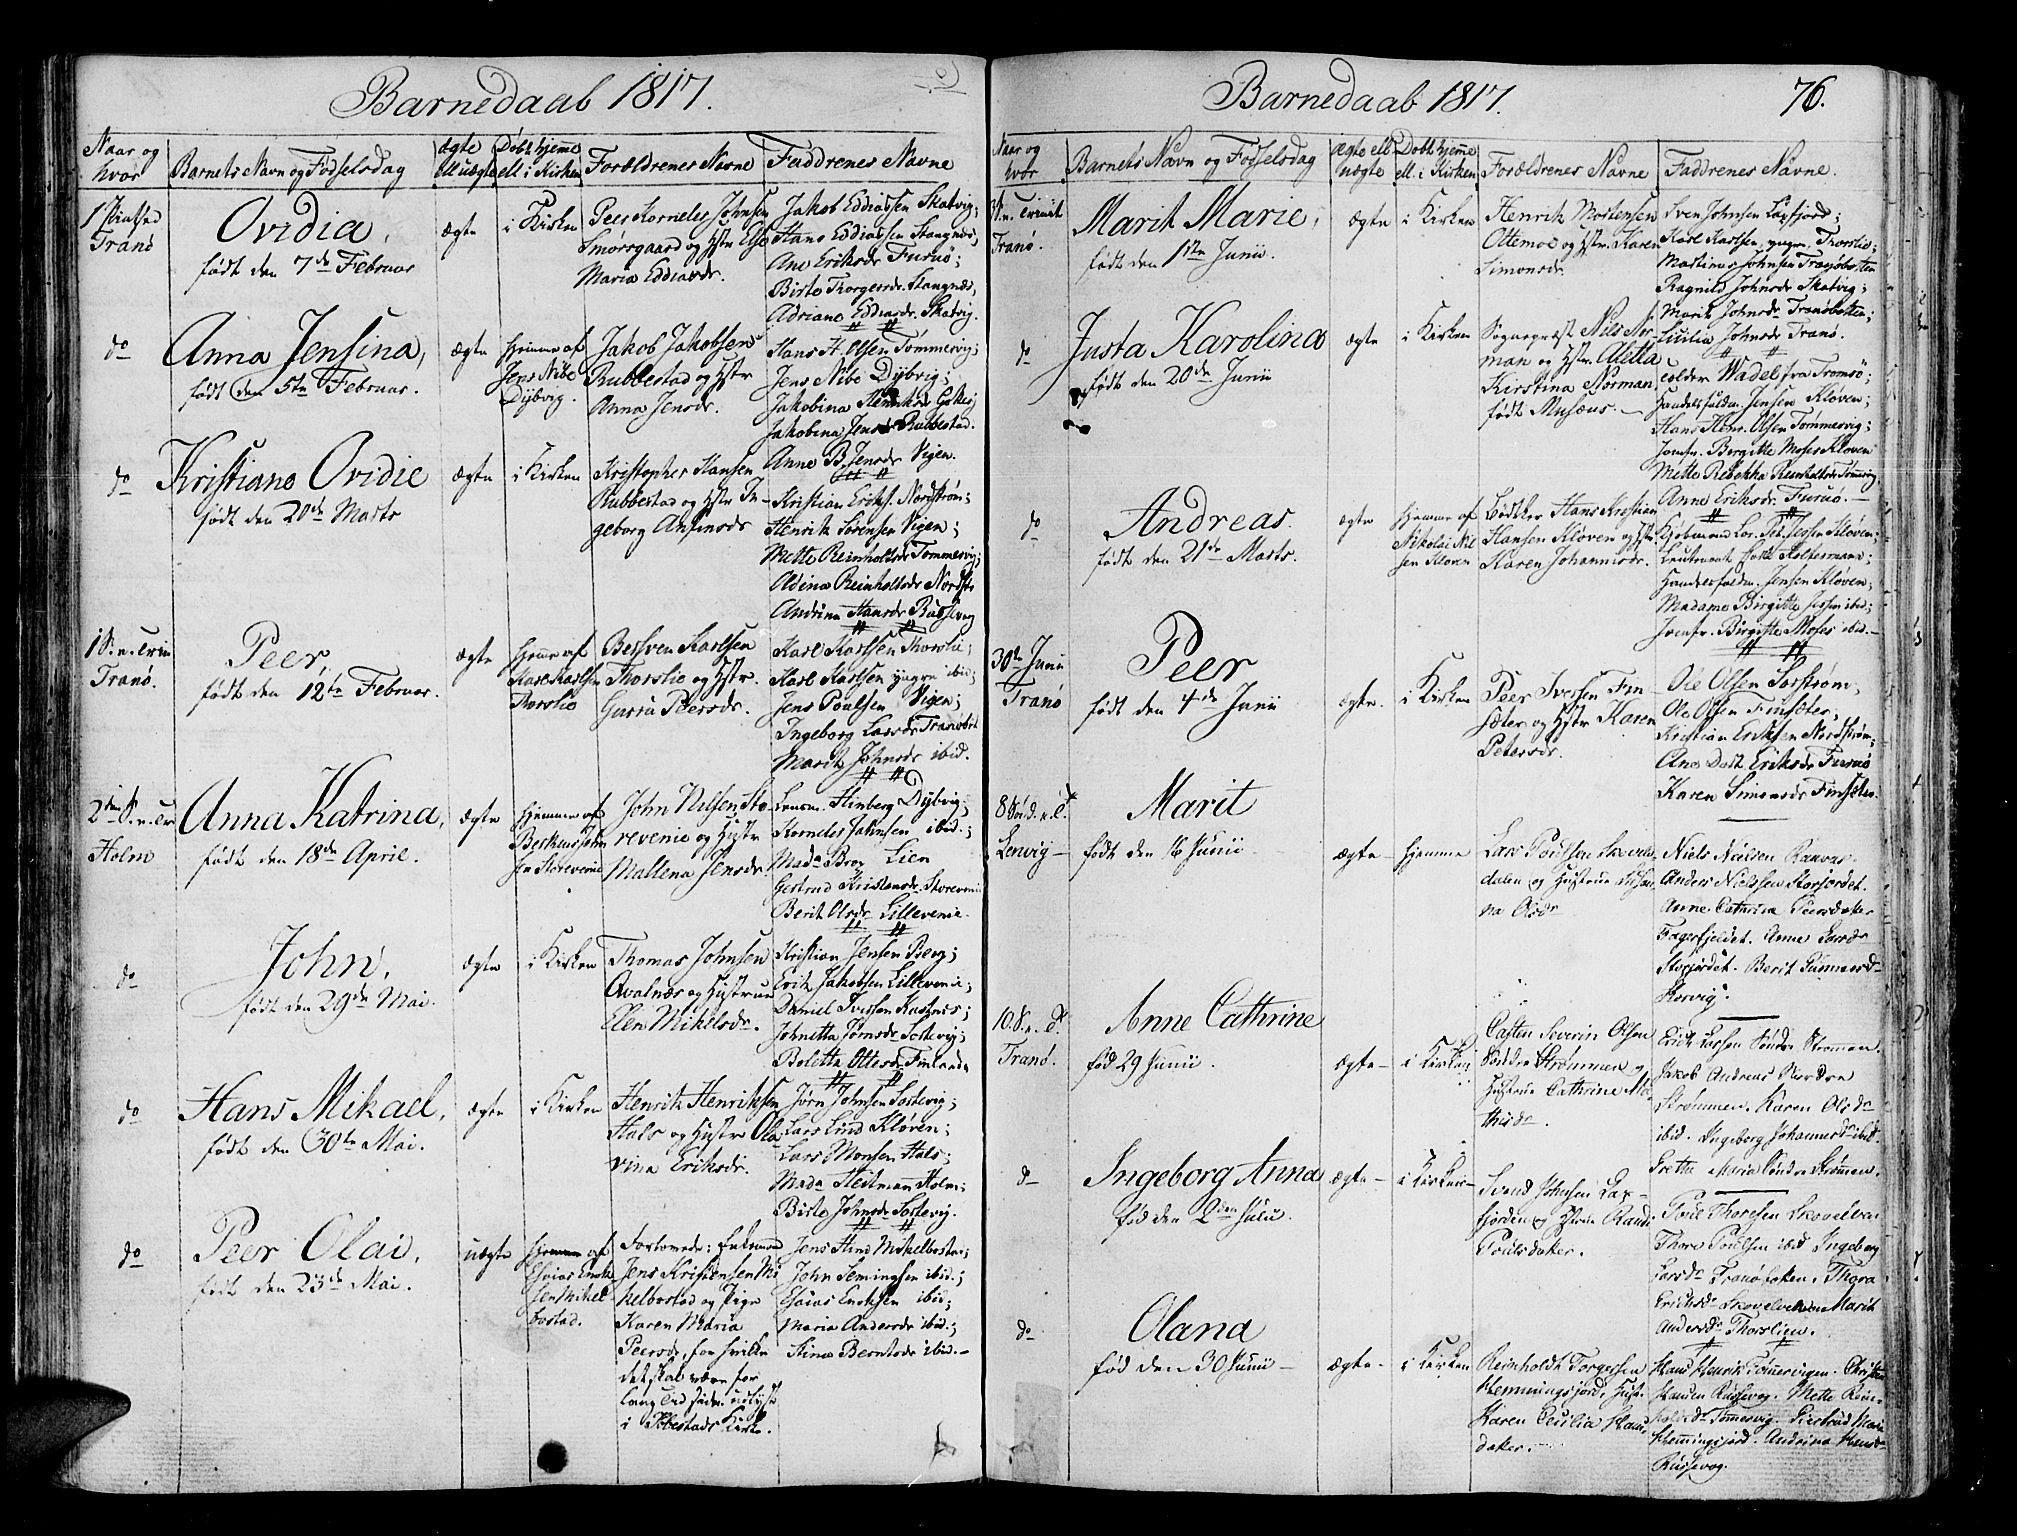 SATØ, Tranøy sokneprestkontor, I/Ia/Iaa/L0003kirke: Ministerialbok nr. 3, 1807-1820, s. 76